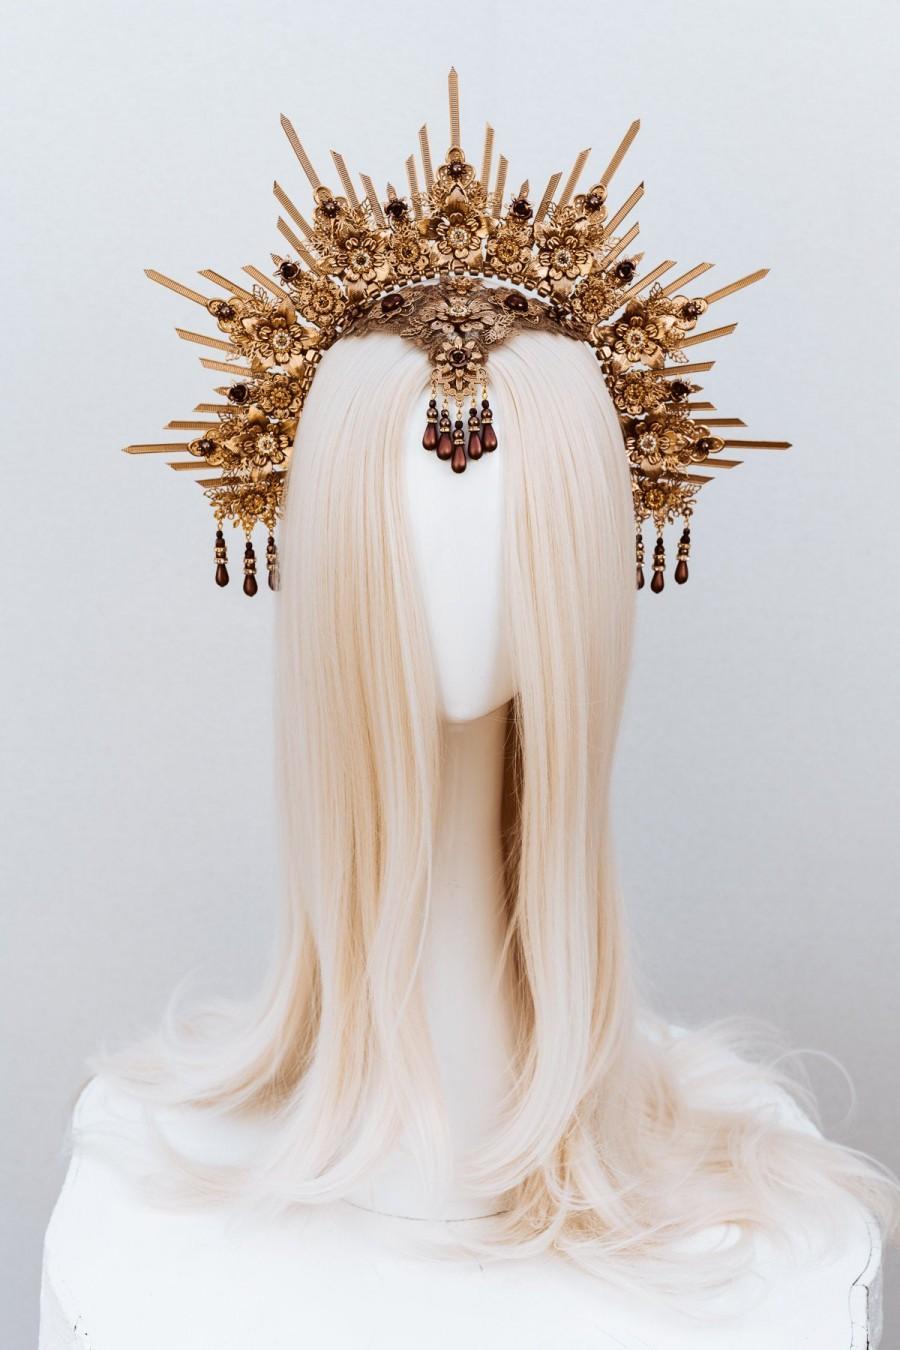 Wedding - Gold Halo Crown, Halo, Halo Crown, Halo Headpiece, Halo Headband, Halo Headlights, Crown, Gold Halo, Headpiece, Wedding Crown, Headband